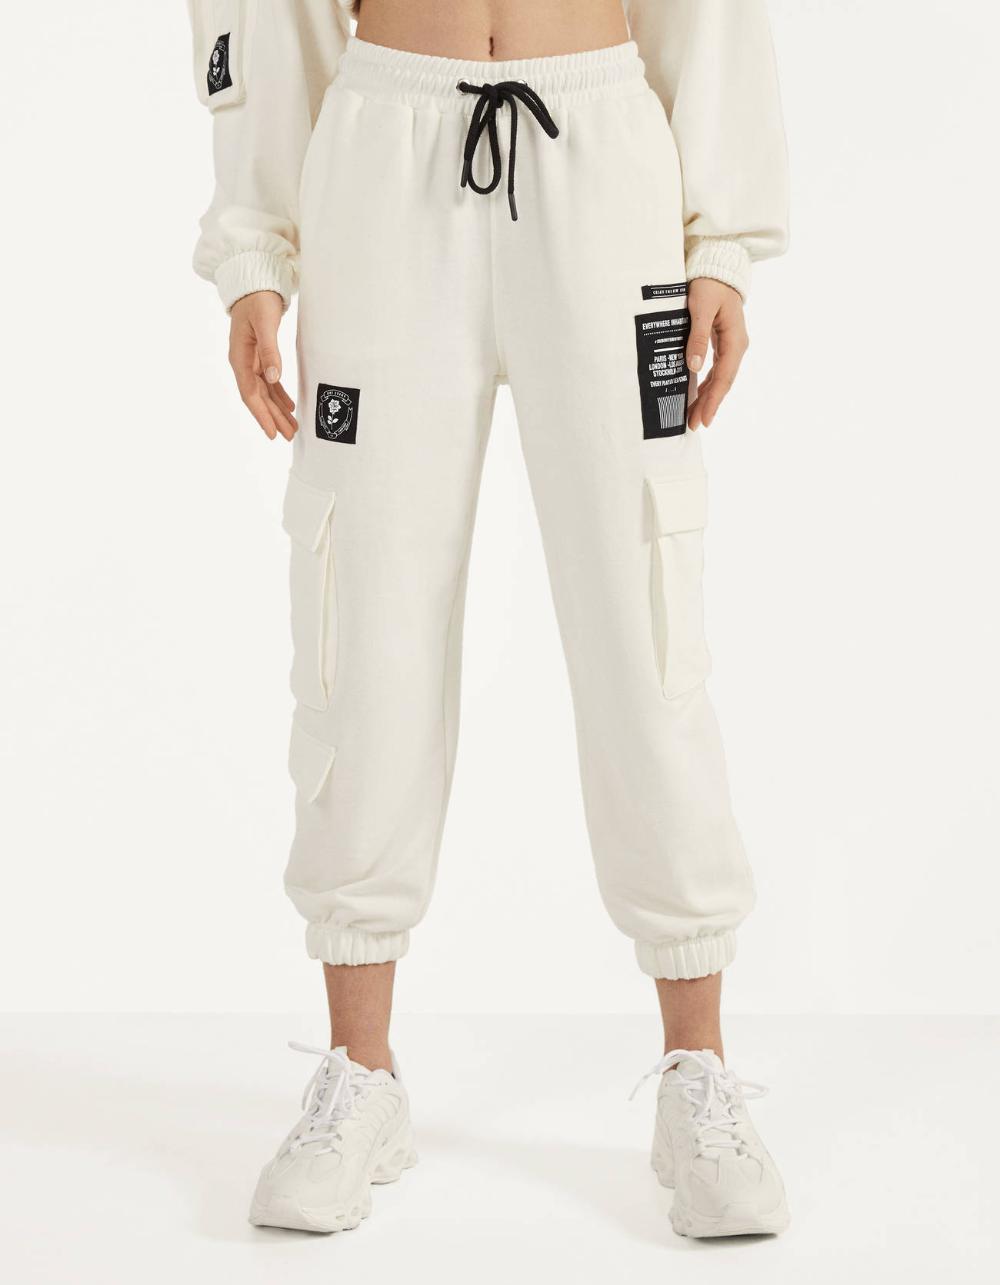 Pantalon Wide Leg Best Sellers Bershka Espana Trousers Women Sweatpants Comfortable Sweater